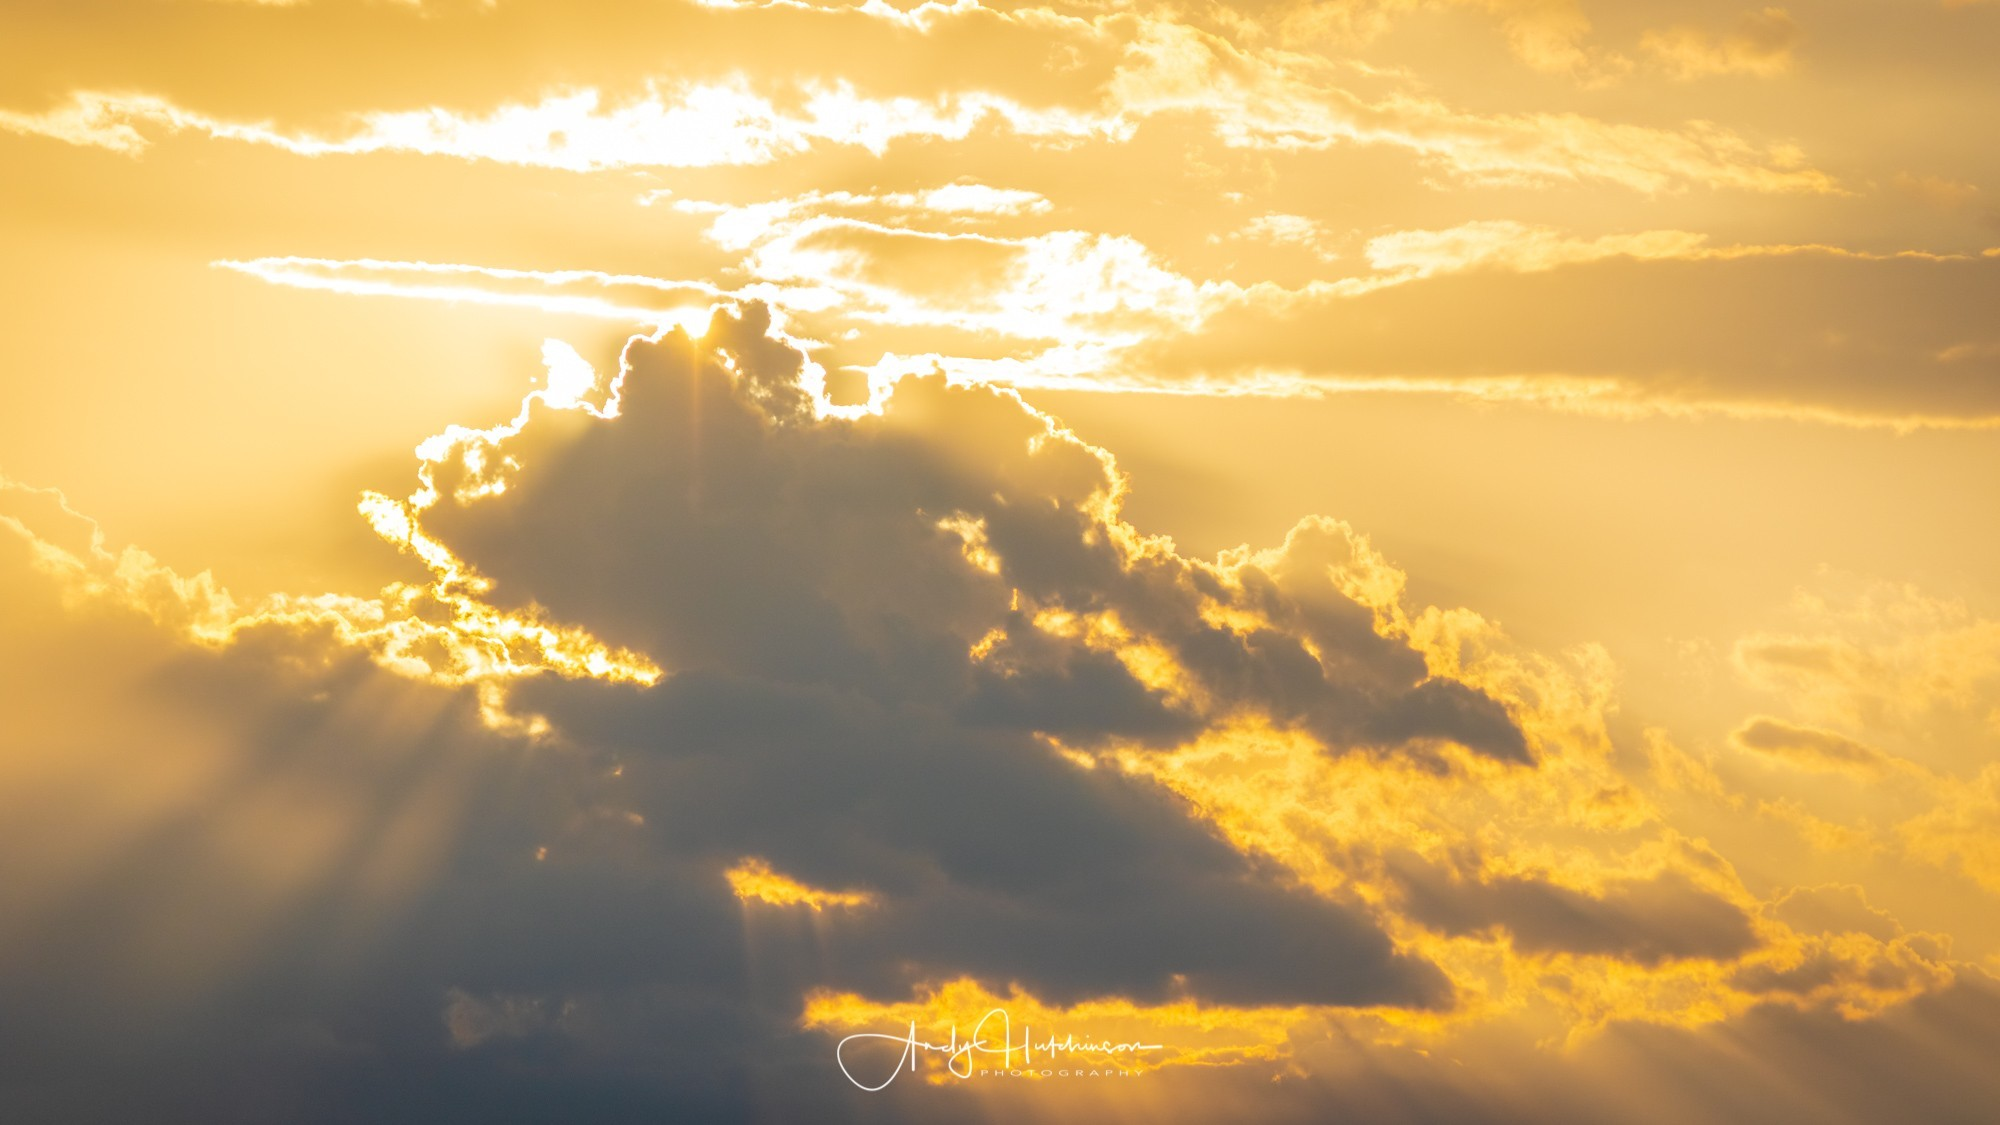 More dramatic sun-rays.